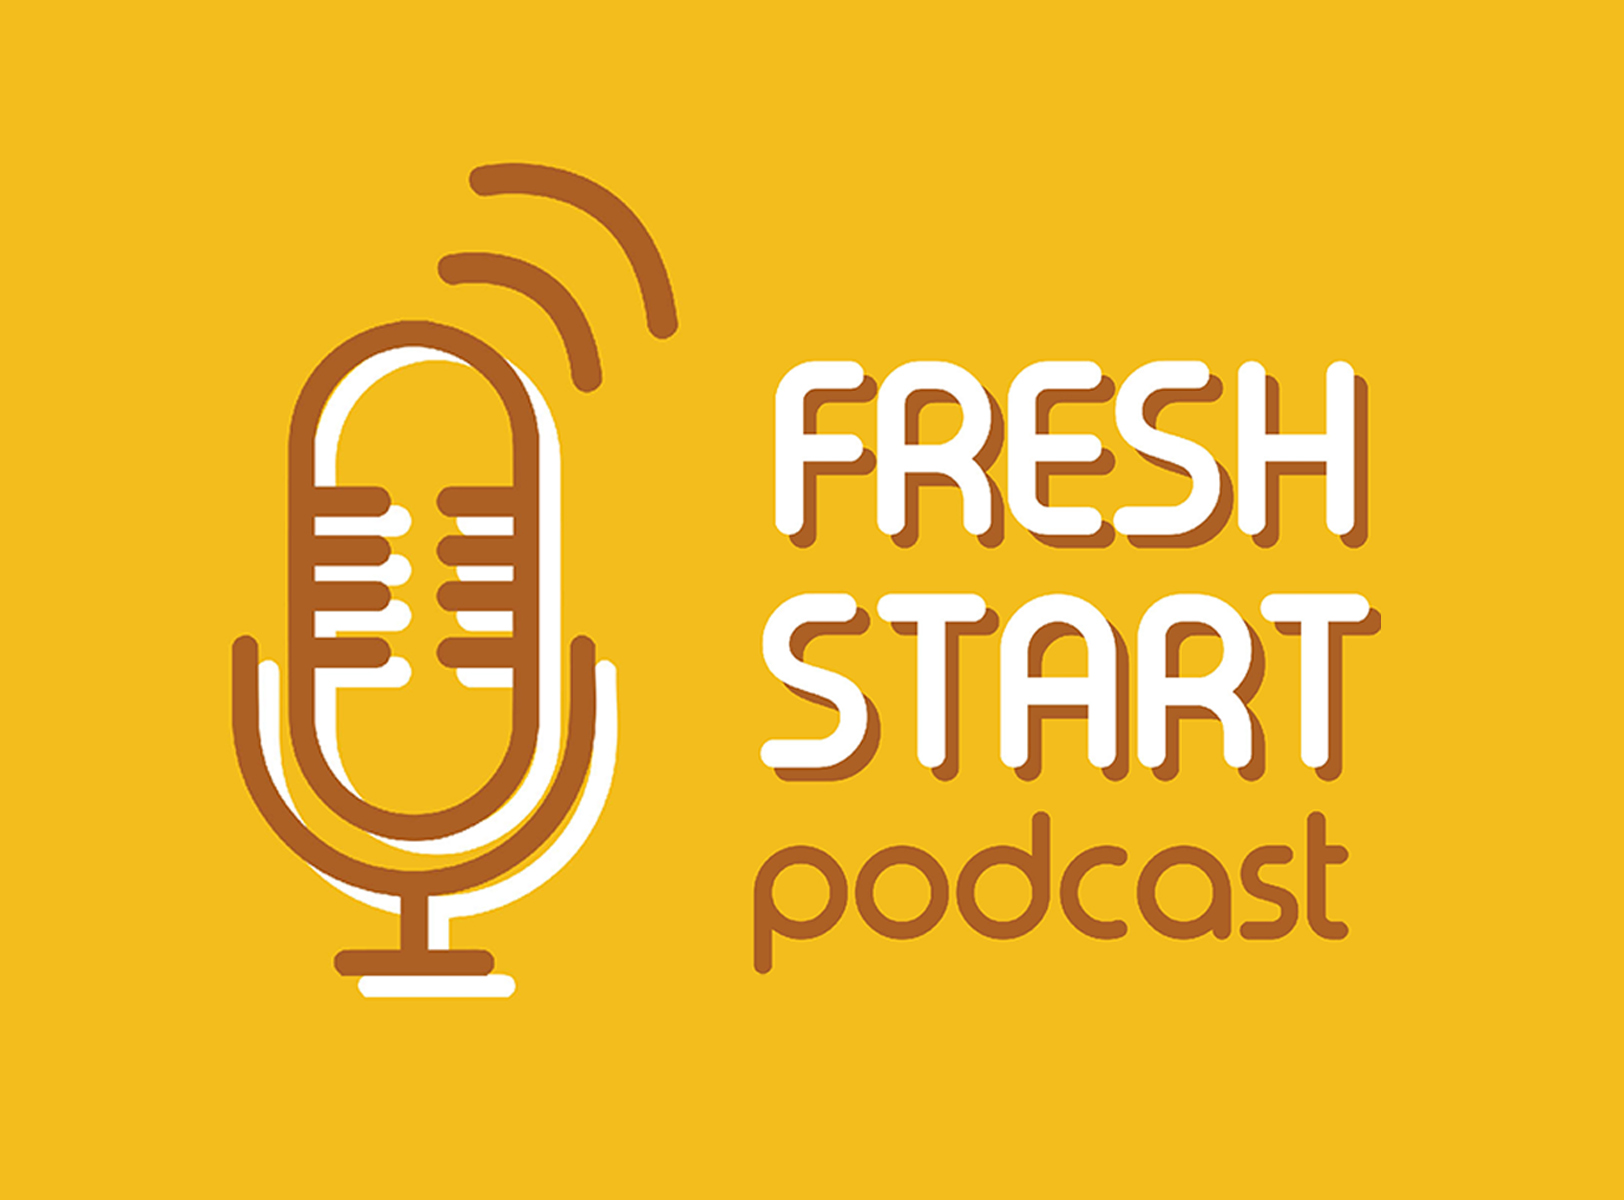 Fresh Start: Podcast News (4/6/2019 Sat.)